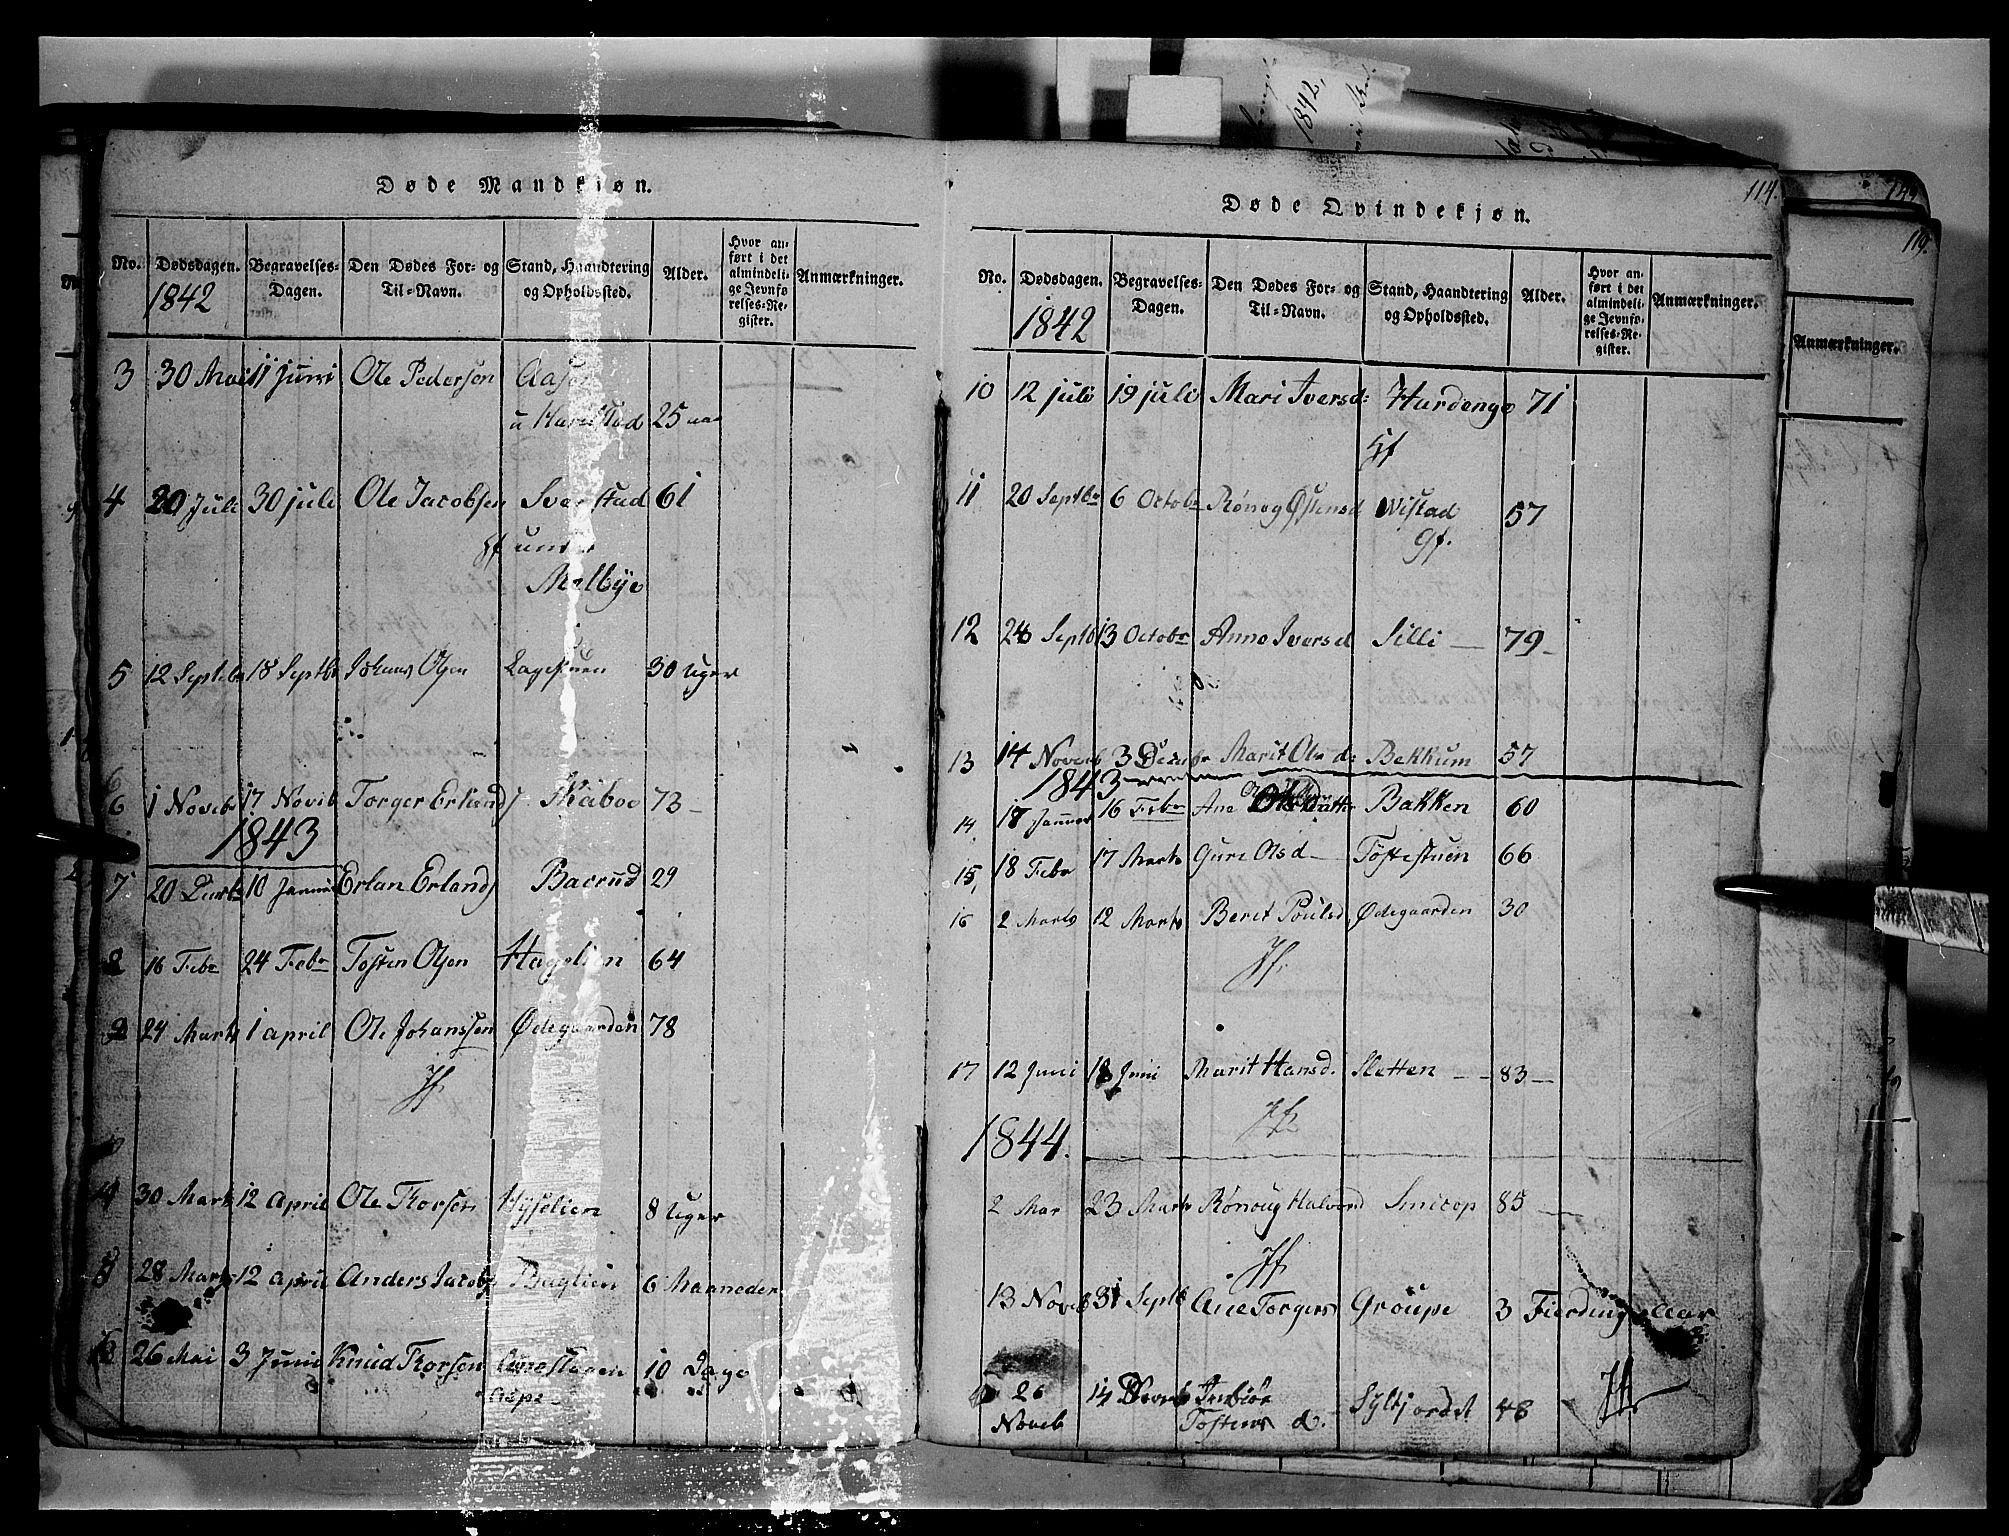 SAH, Fron prestekontor, H/Ha/Hab/L0003: Klokkerbok nr. 3, 1816-1850, s. 114